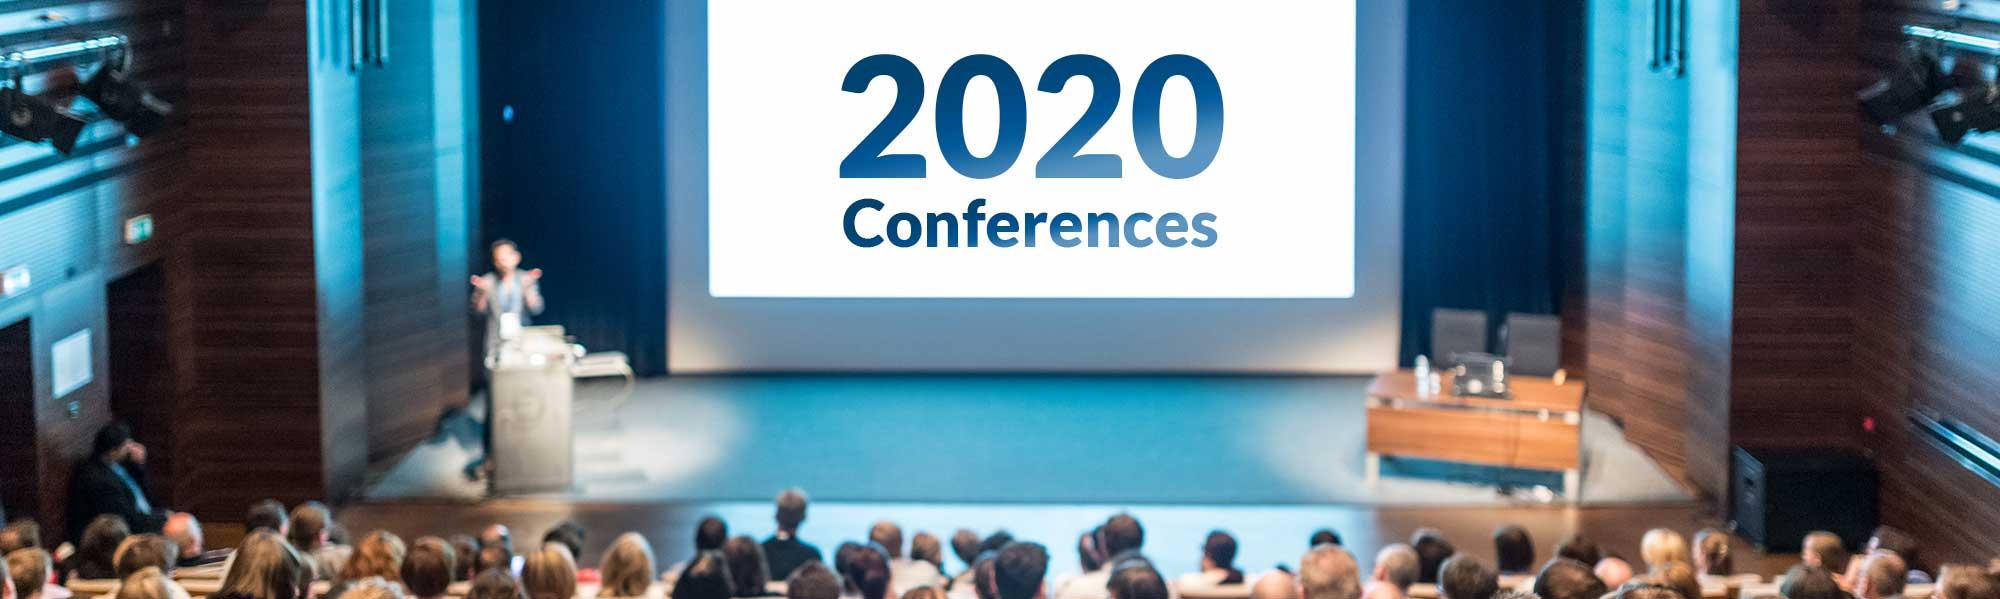 2020 conferences audience